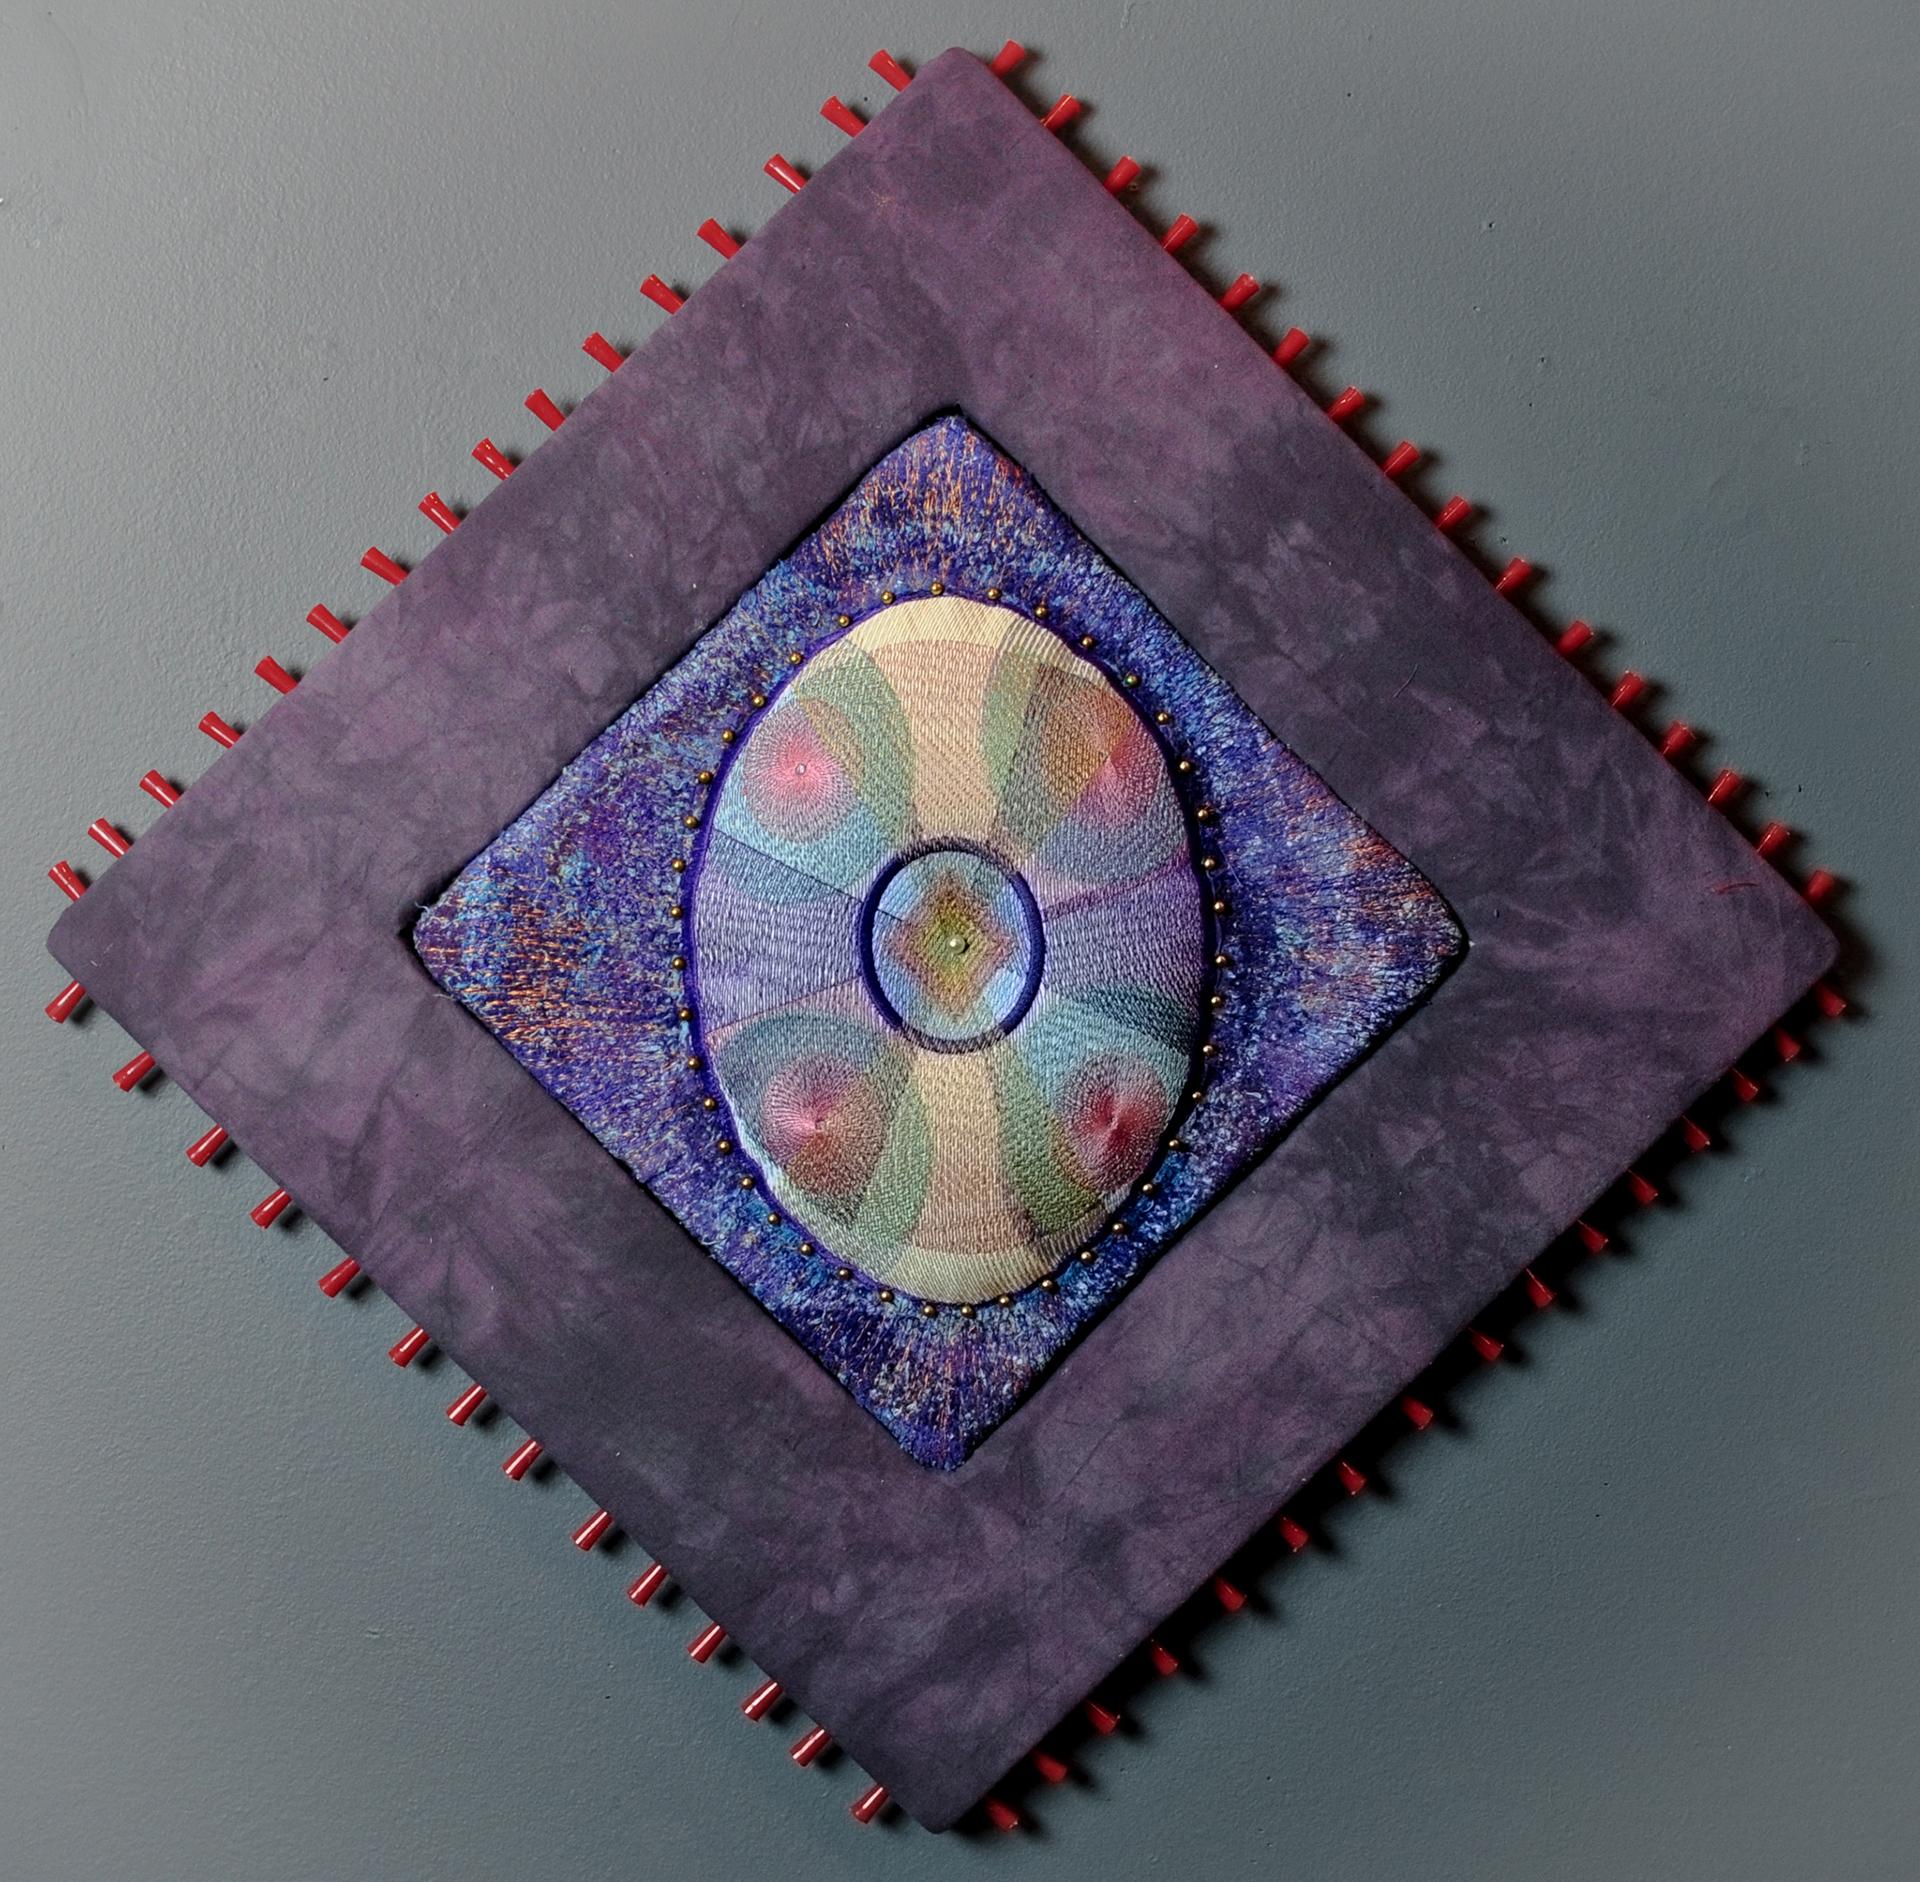 digital embroidery artwork